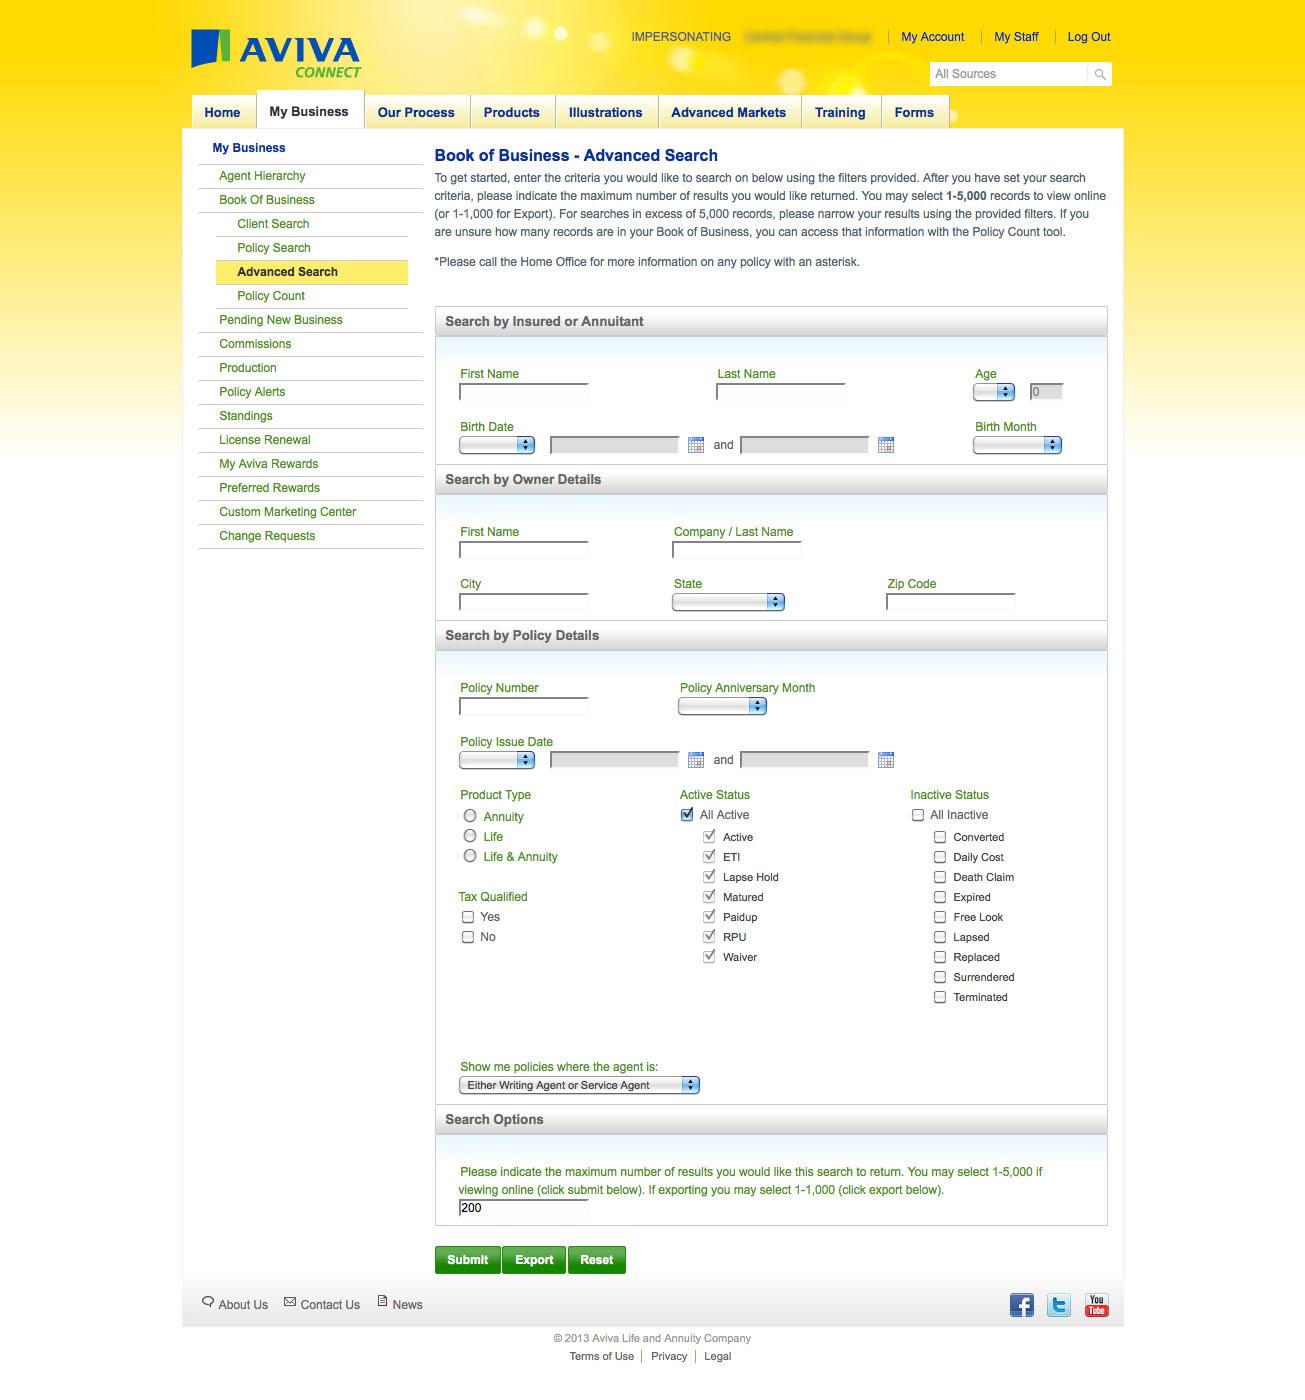 AvivaConnect_Advanced Search 2013-07-11 11-23-55.jpeg